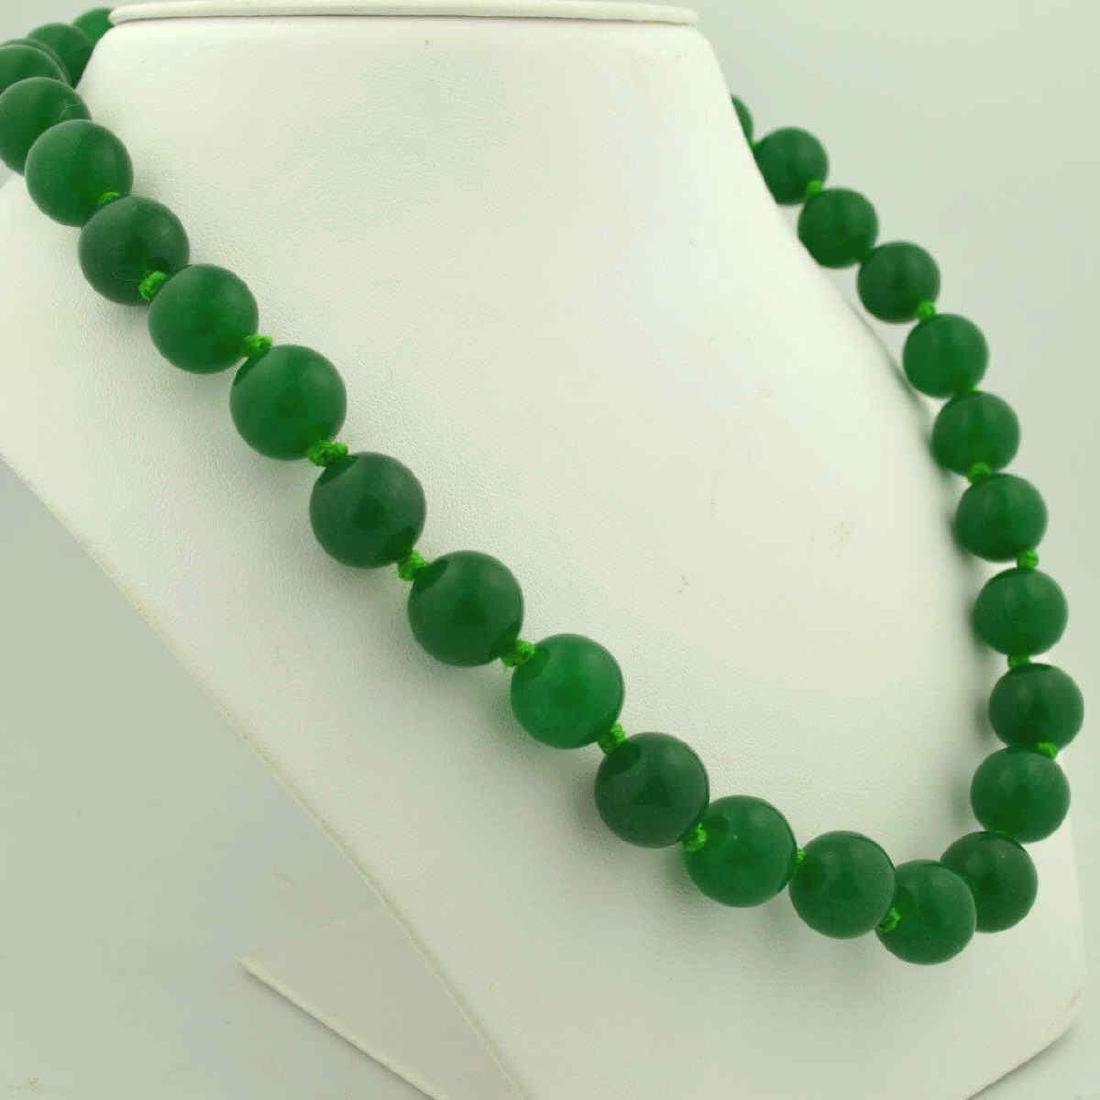 Green Quart Bead Necklace - 2